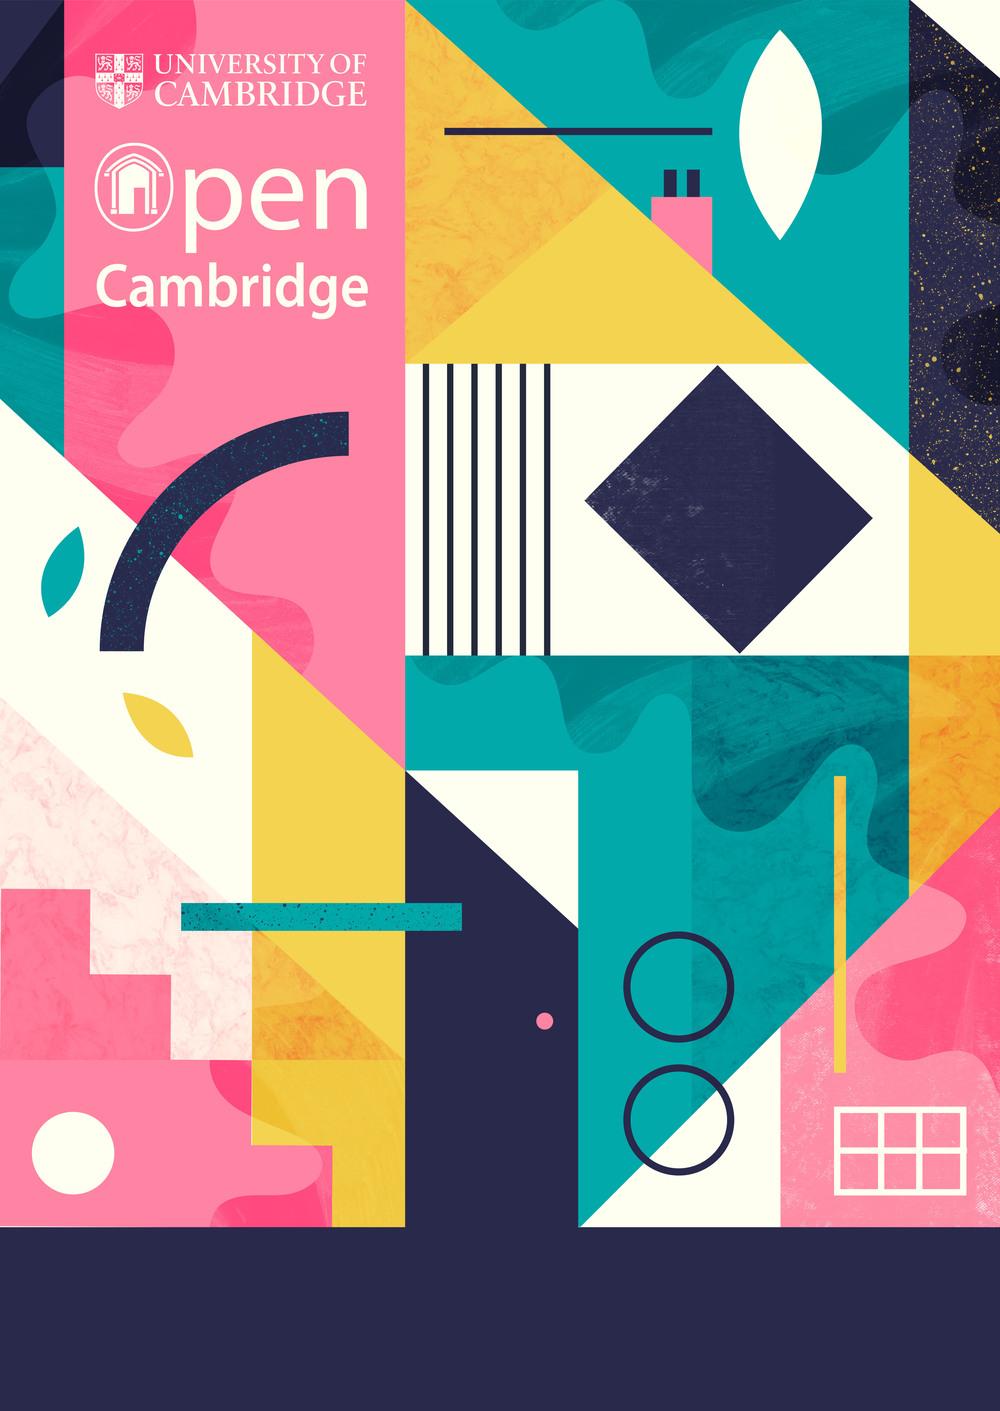 hannahalice-illustration-opencambridgefestival-abstract-cambridgeuniversity.jpg